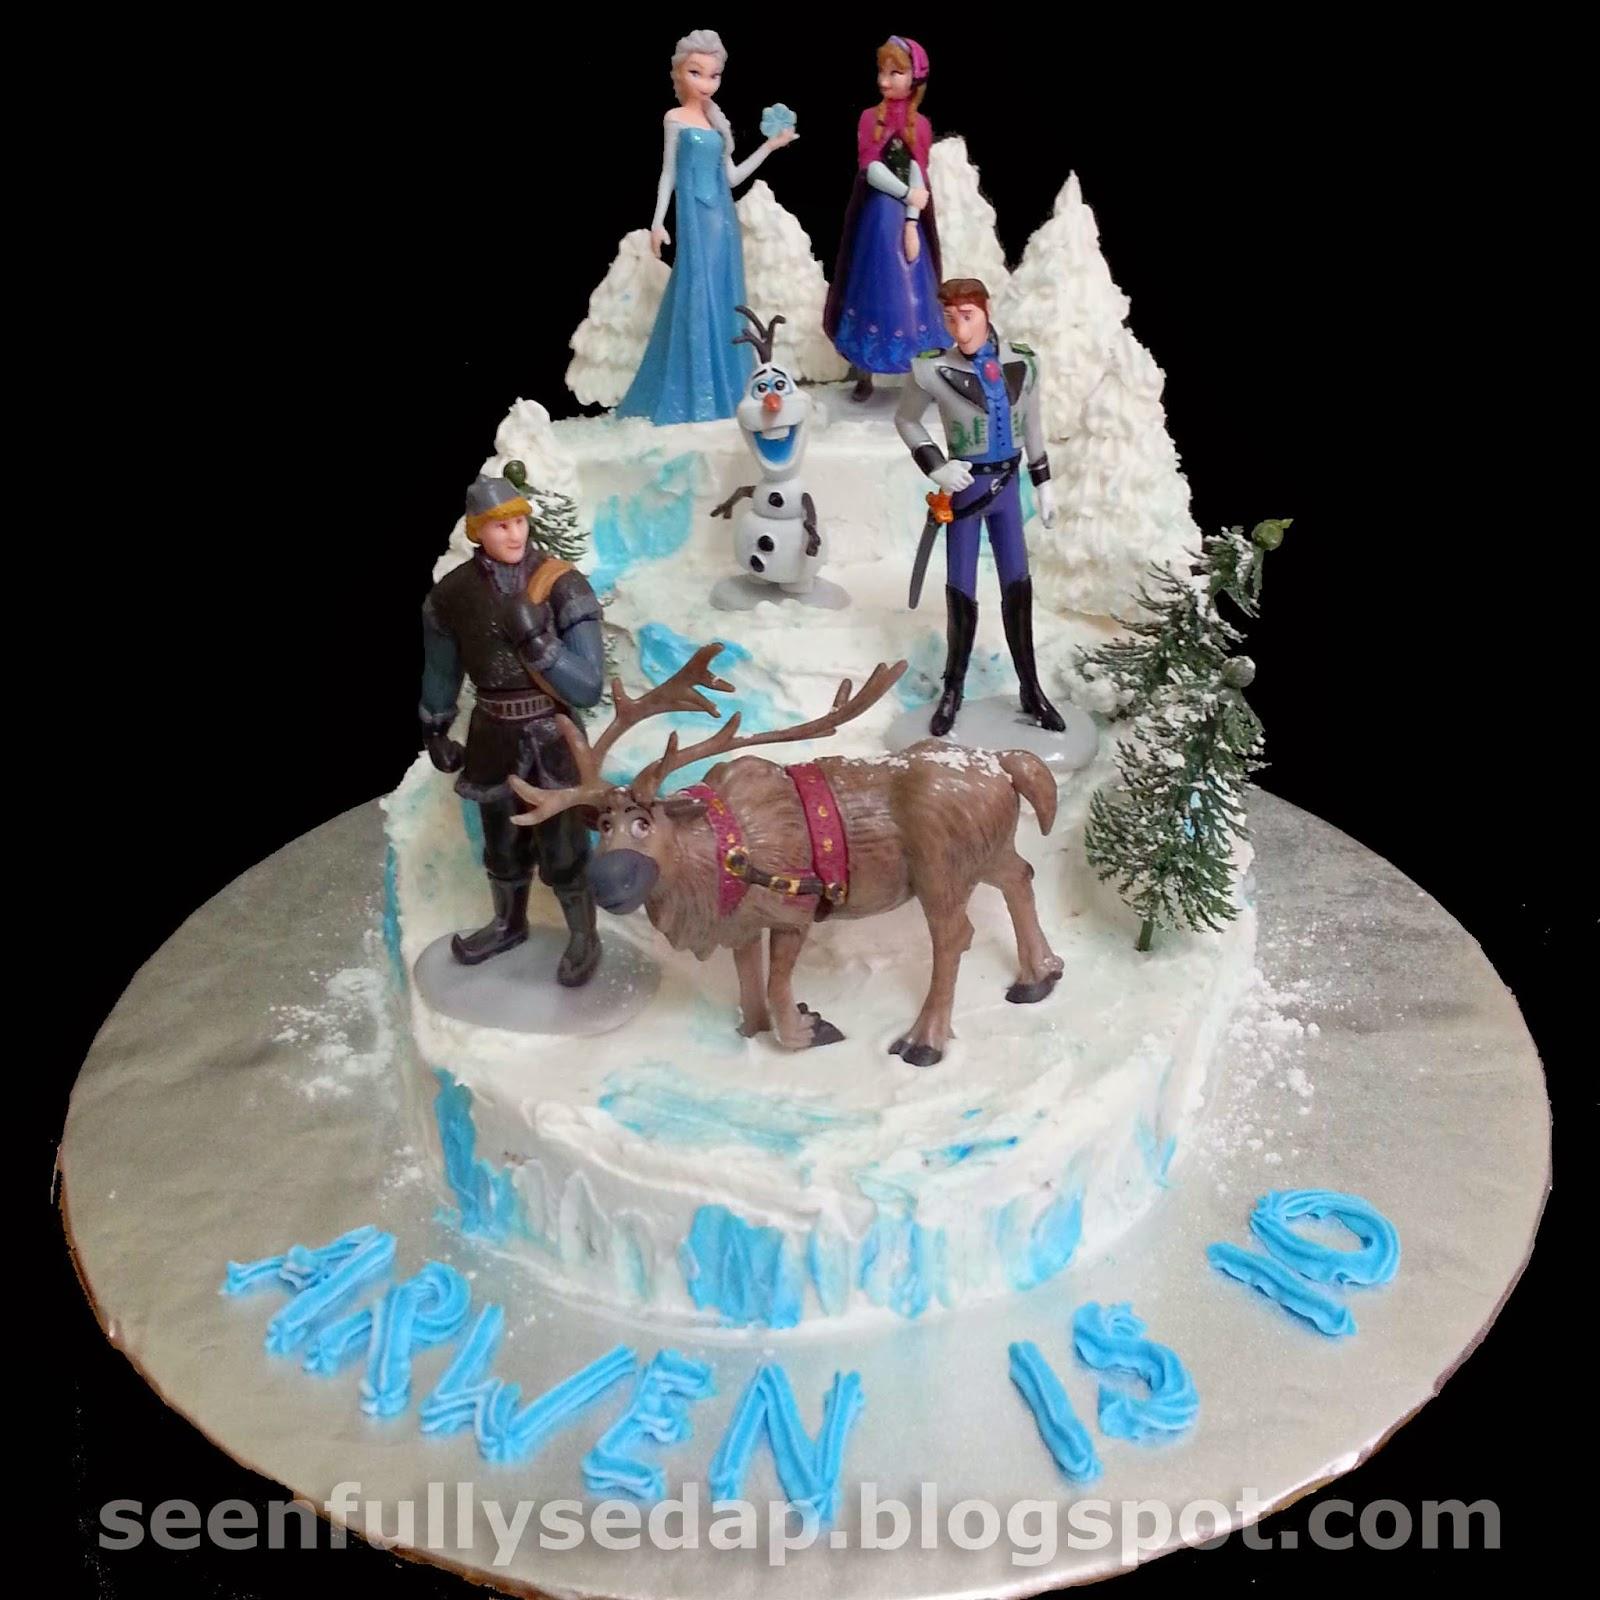 Seenfully Sedap Frozen Birthday Cake